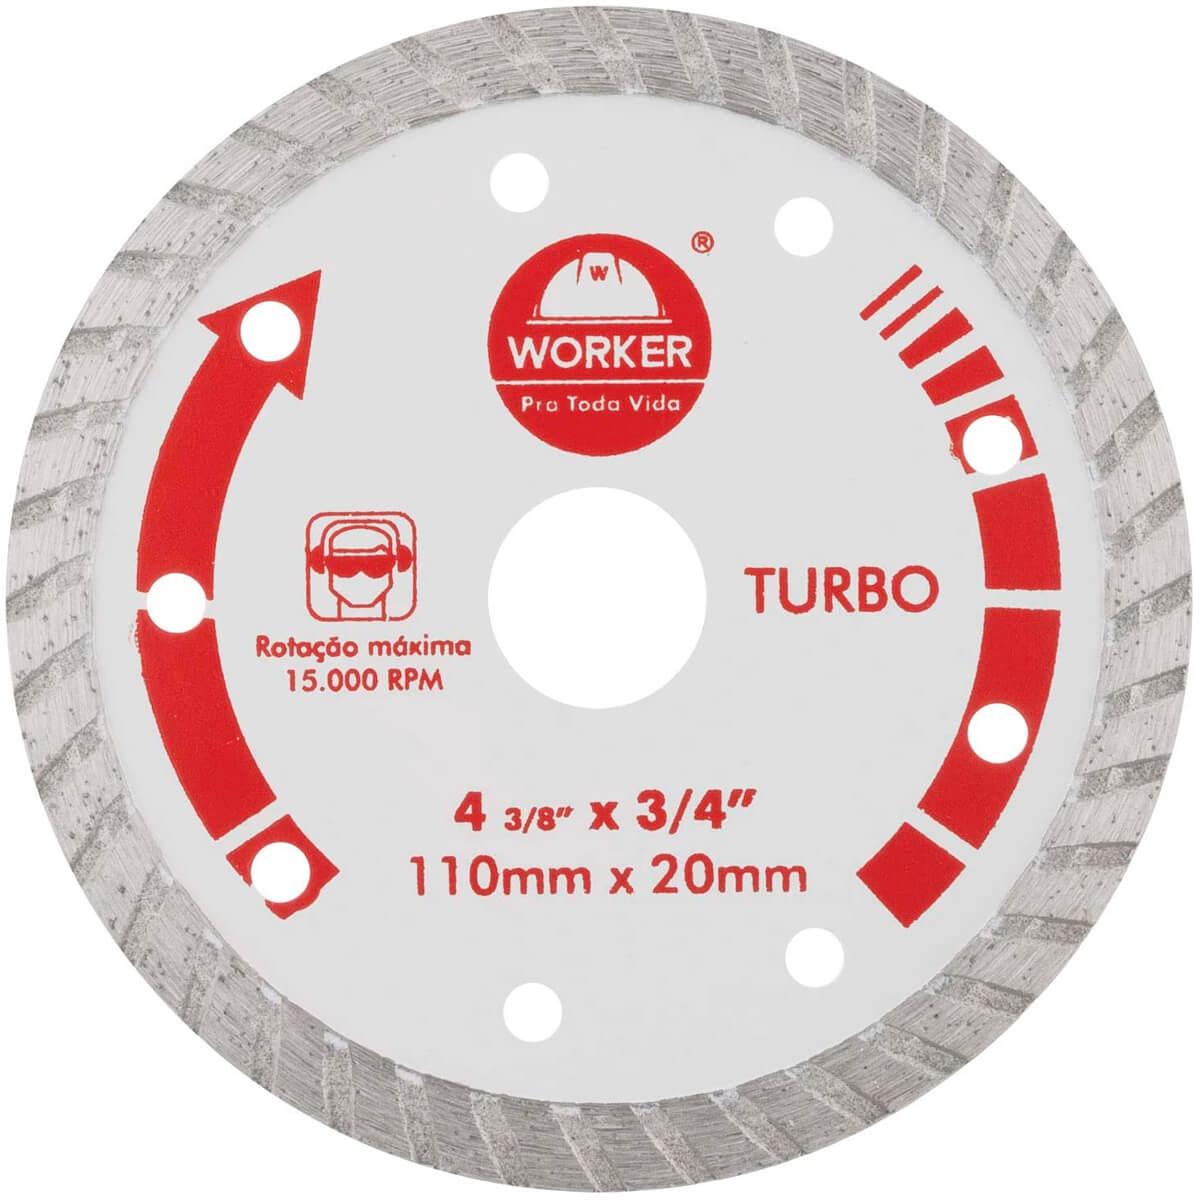 Disco Diamantado Turbo 110X20MM Worker - 139629